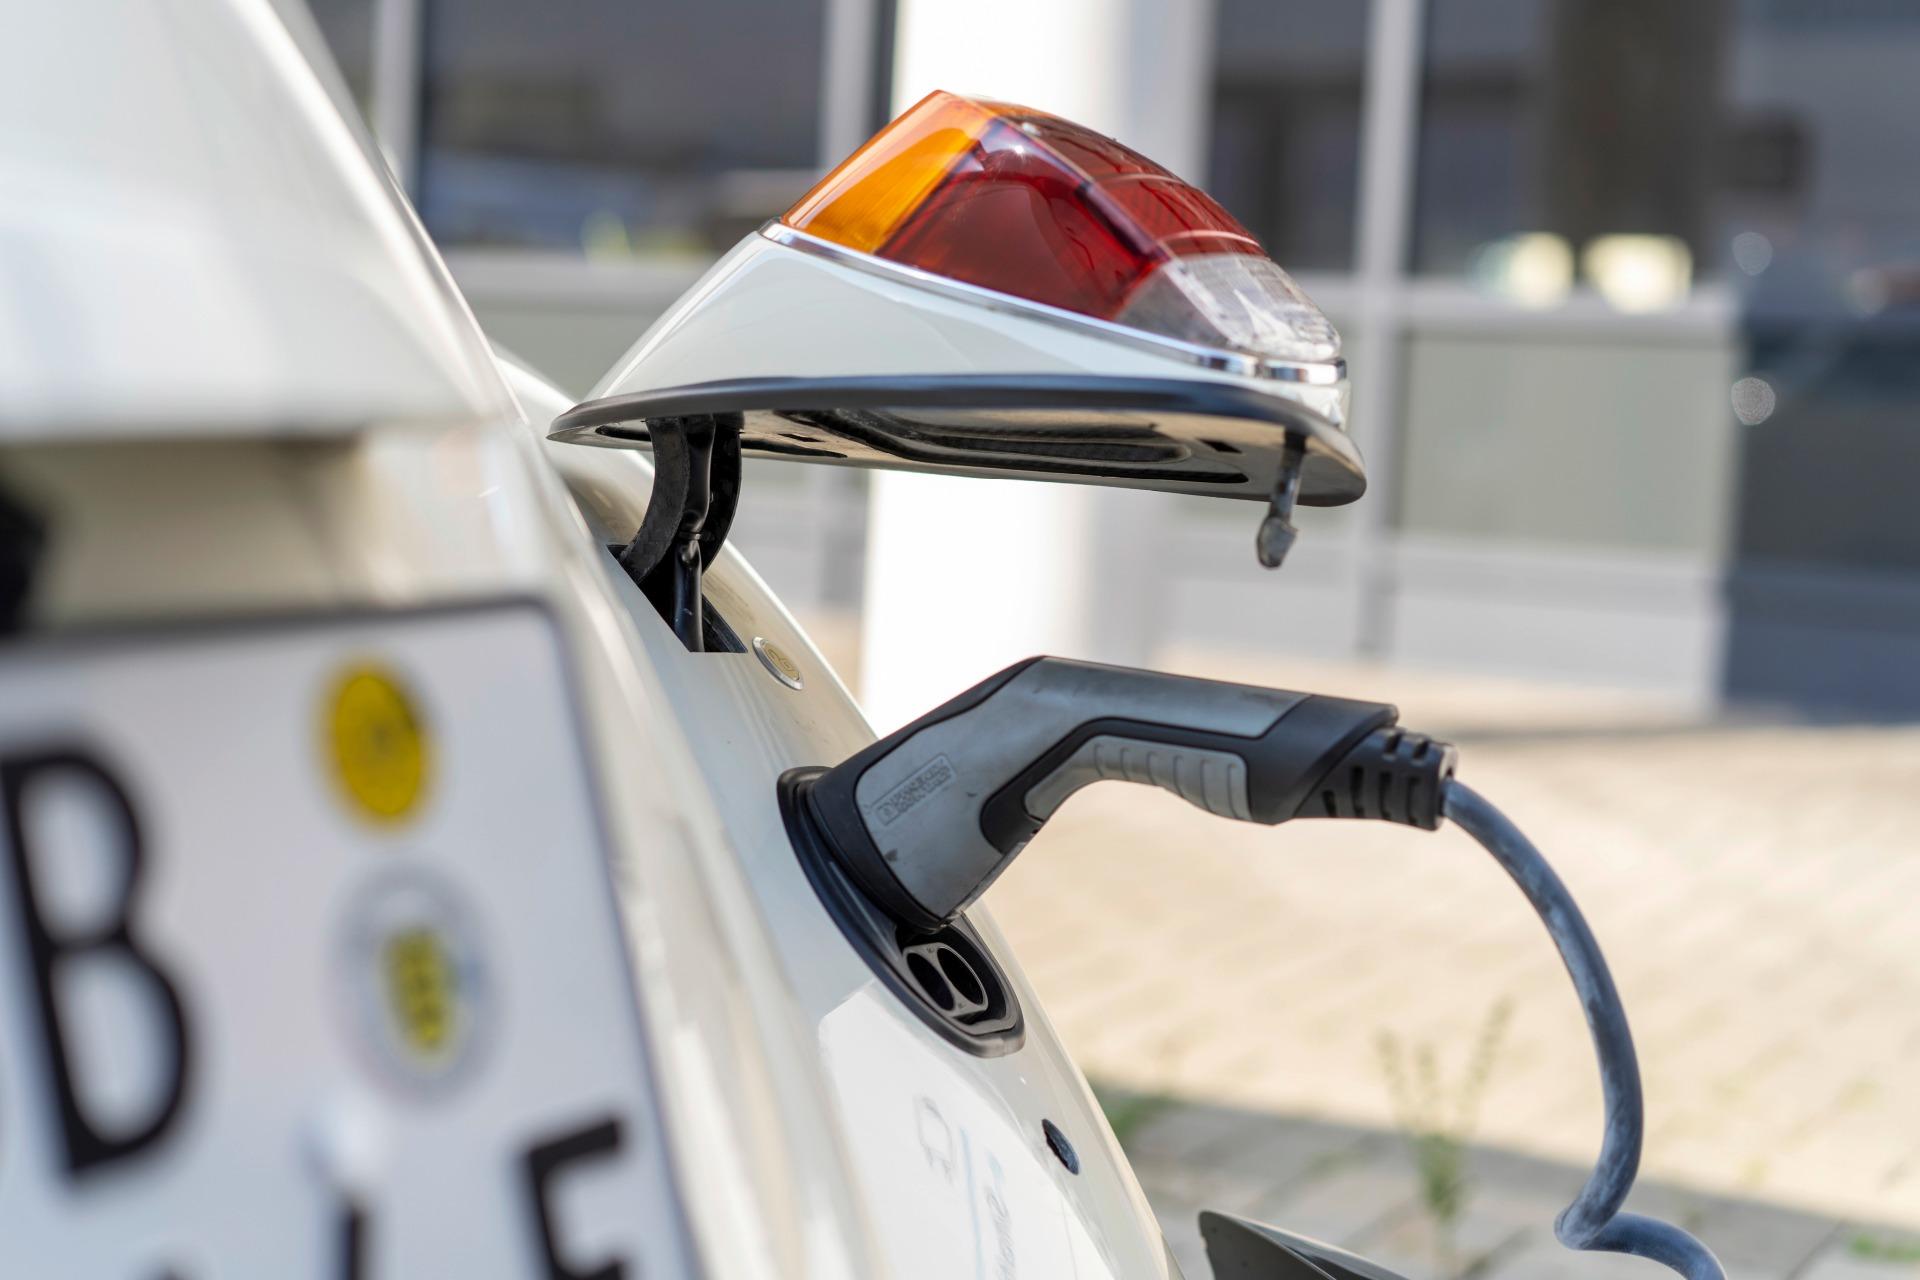 Традиционный VW Beetle переоборудовали вэлектрокар